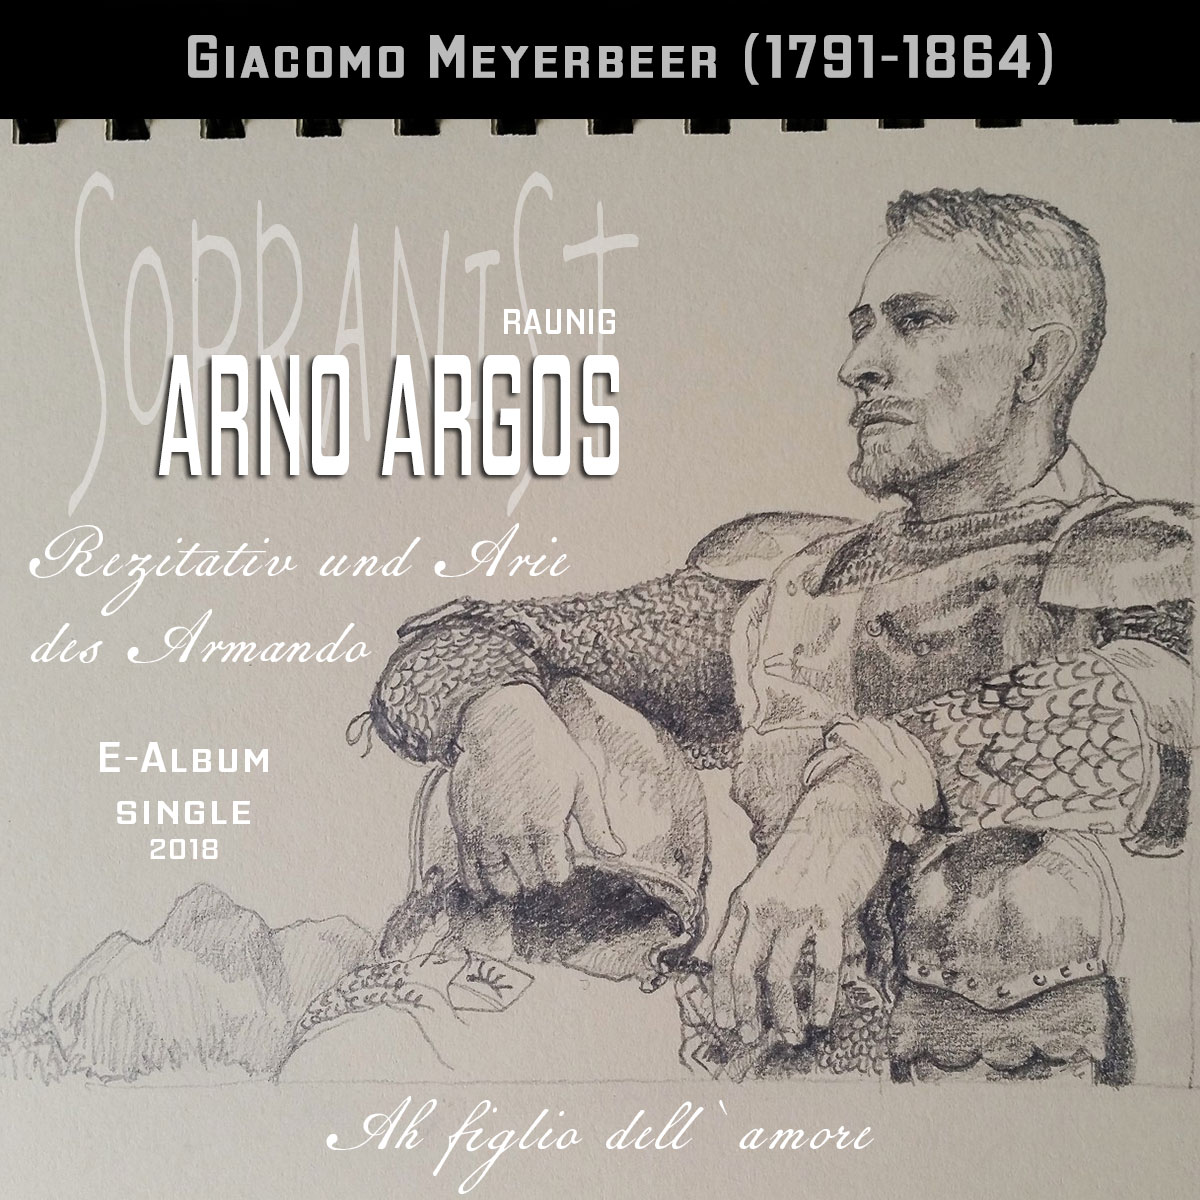 ealbum_Meyerbeer_ArnoArgos_b